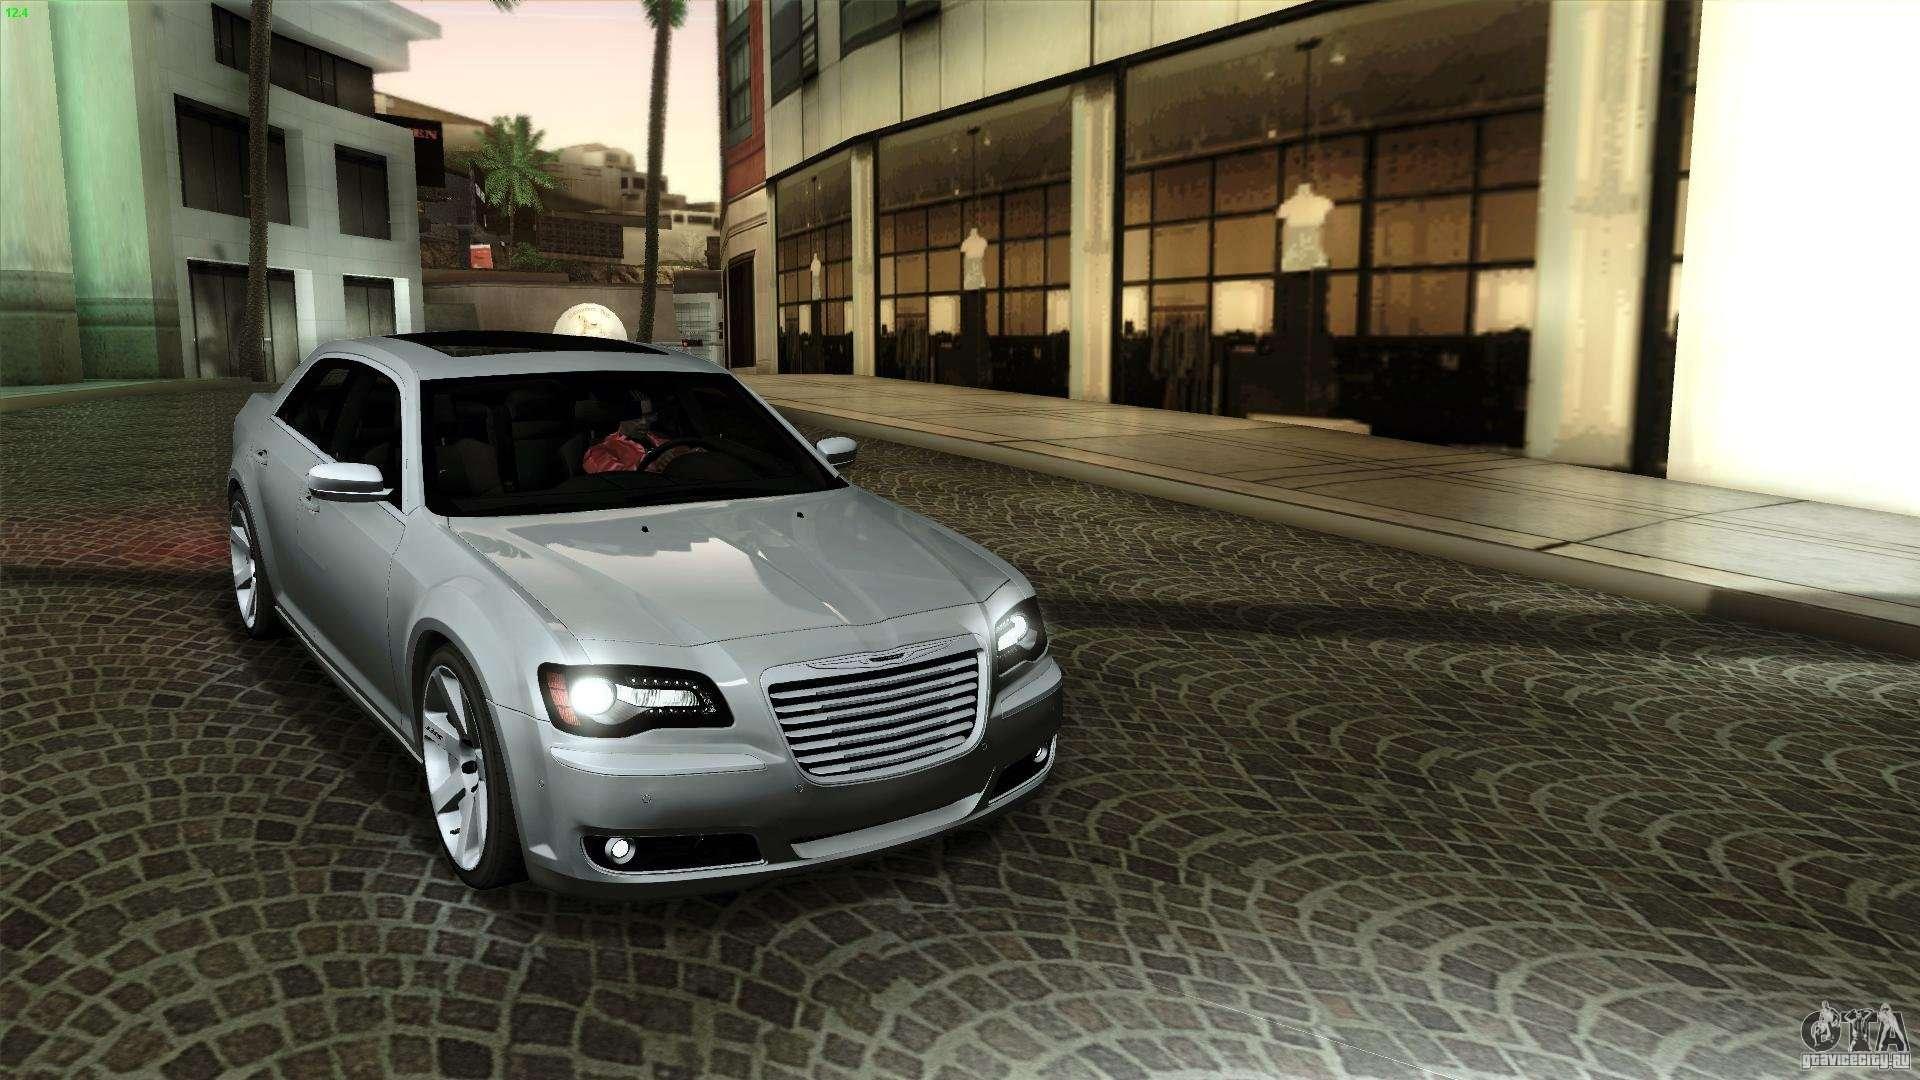 Chrysler 300C V8 Hemi Sedan 2011 for GTA San Andreas on gta 5 mitsubishi eclipse, gta 5 batmobile, gta 5 ferrari 250 gto, gta 5 mitsubishi galant, gta 5 volkswagen passat, gta 5 carbonizzare, gta 5 mitsubishi lancer, gta 5 eagle, gta 5 acura tl, gta 5 shelby mustang, gta 5 nissan 370z, gta 5 nissan gt-r, gta 5 holden commodore, gta 5 porsche 918, gta 5 jaguar x-type, gta 5 chevy malibu, gta 5 nissan 240sx, gta 5 ford bronco, gta 5 hennessey venom gt, gta 5 acura nsx,